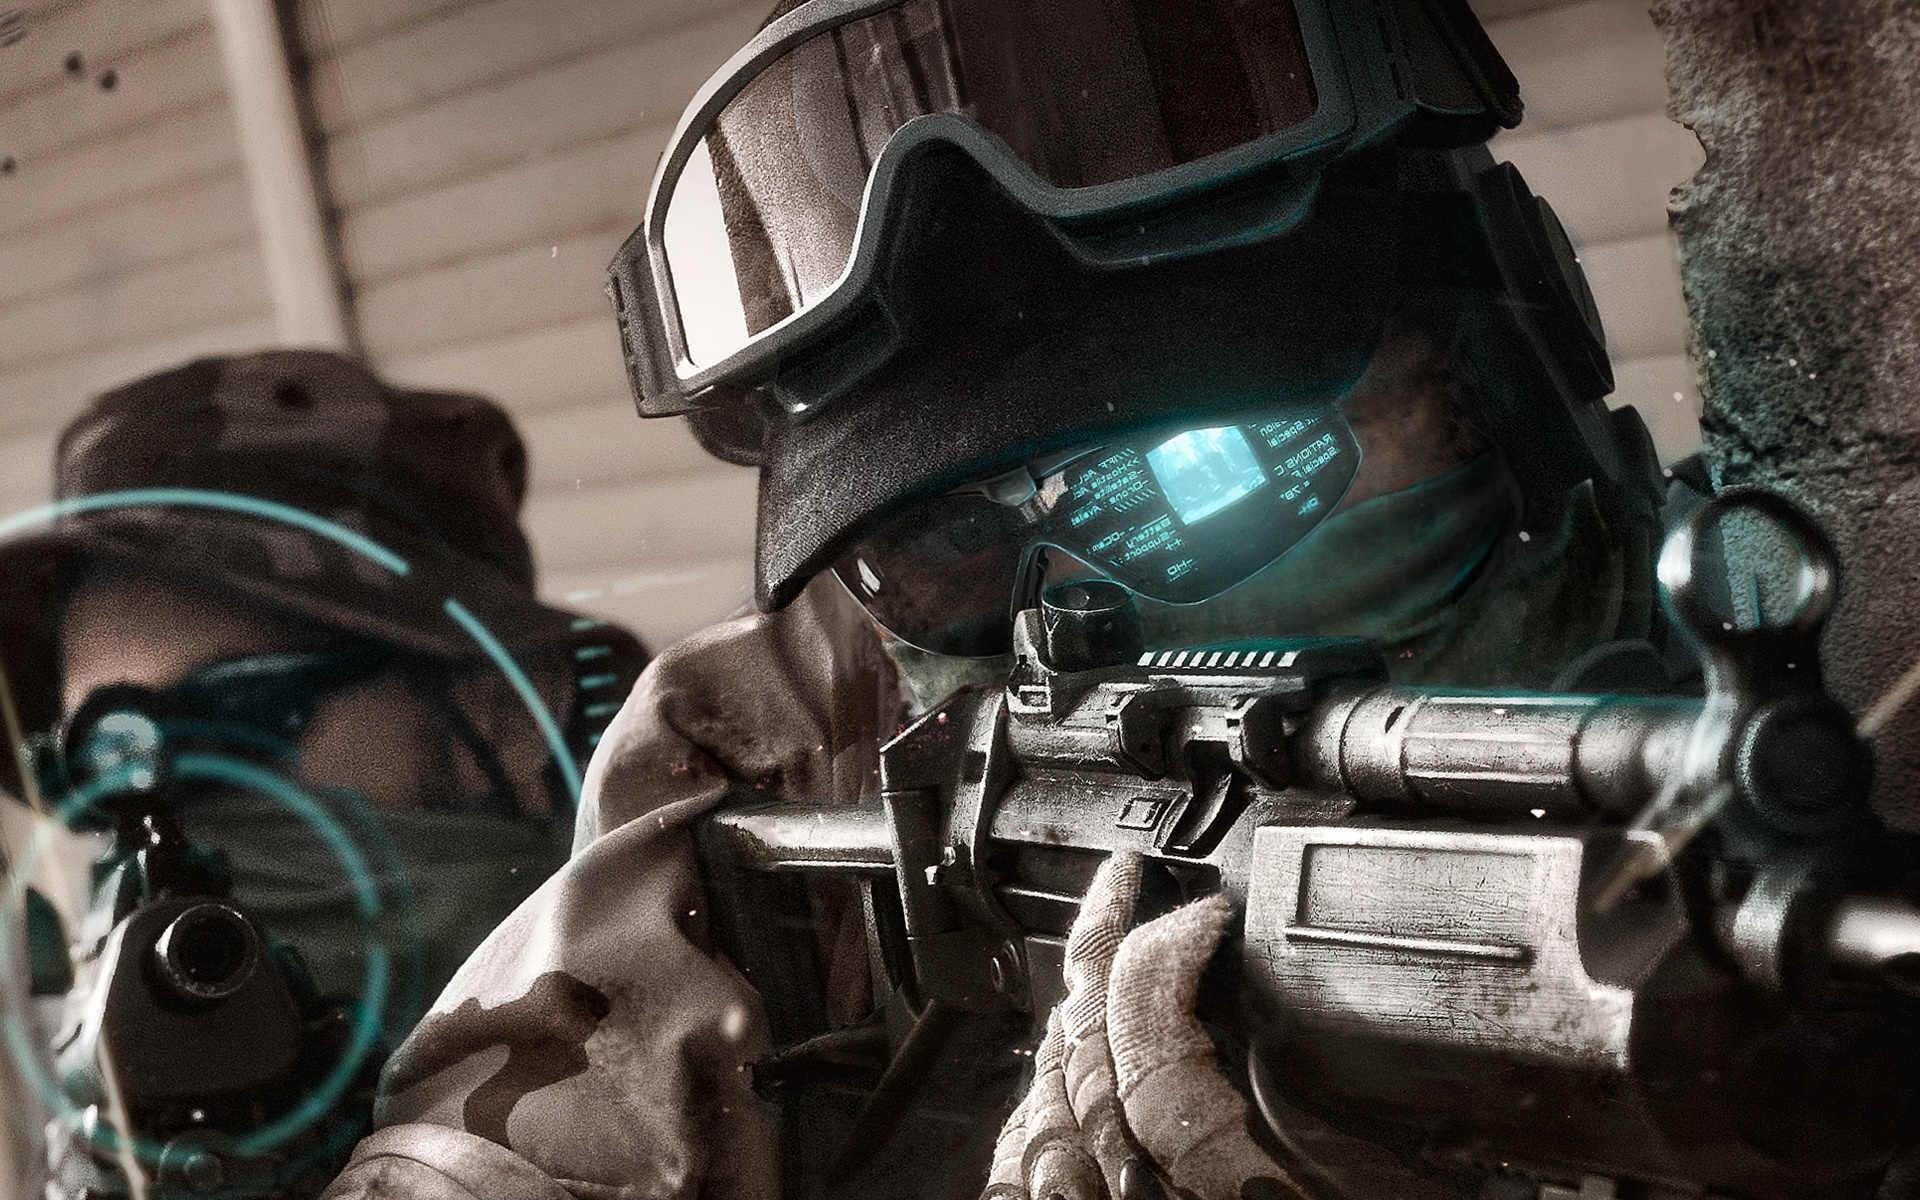 future_soldier_ghost_recon-1920x1200+1.jpg